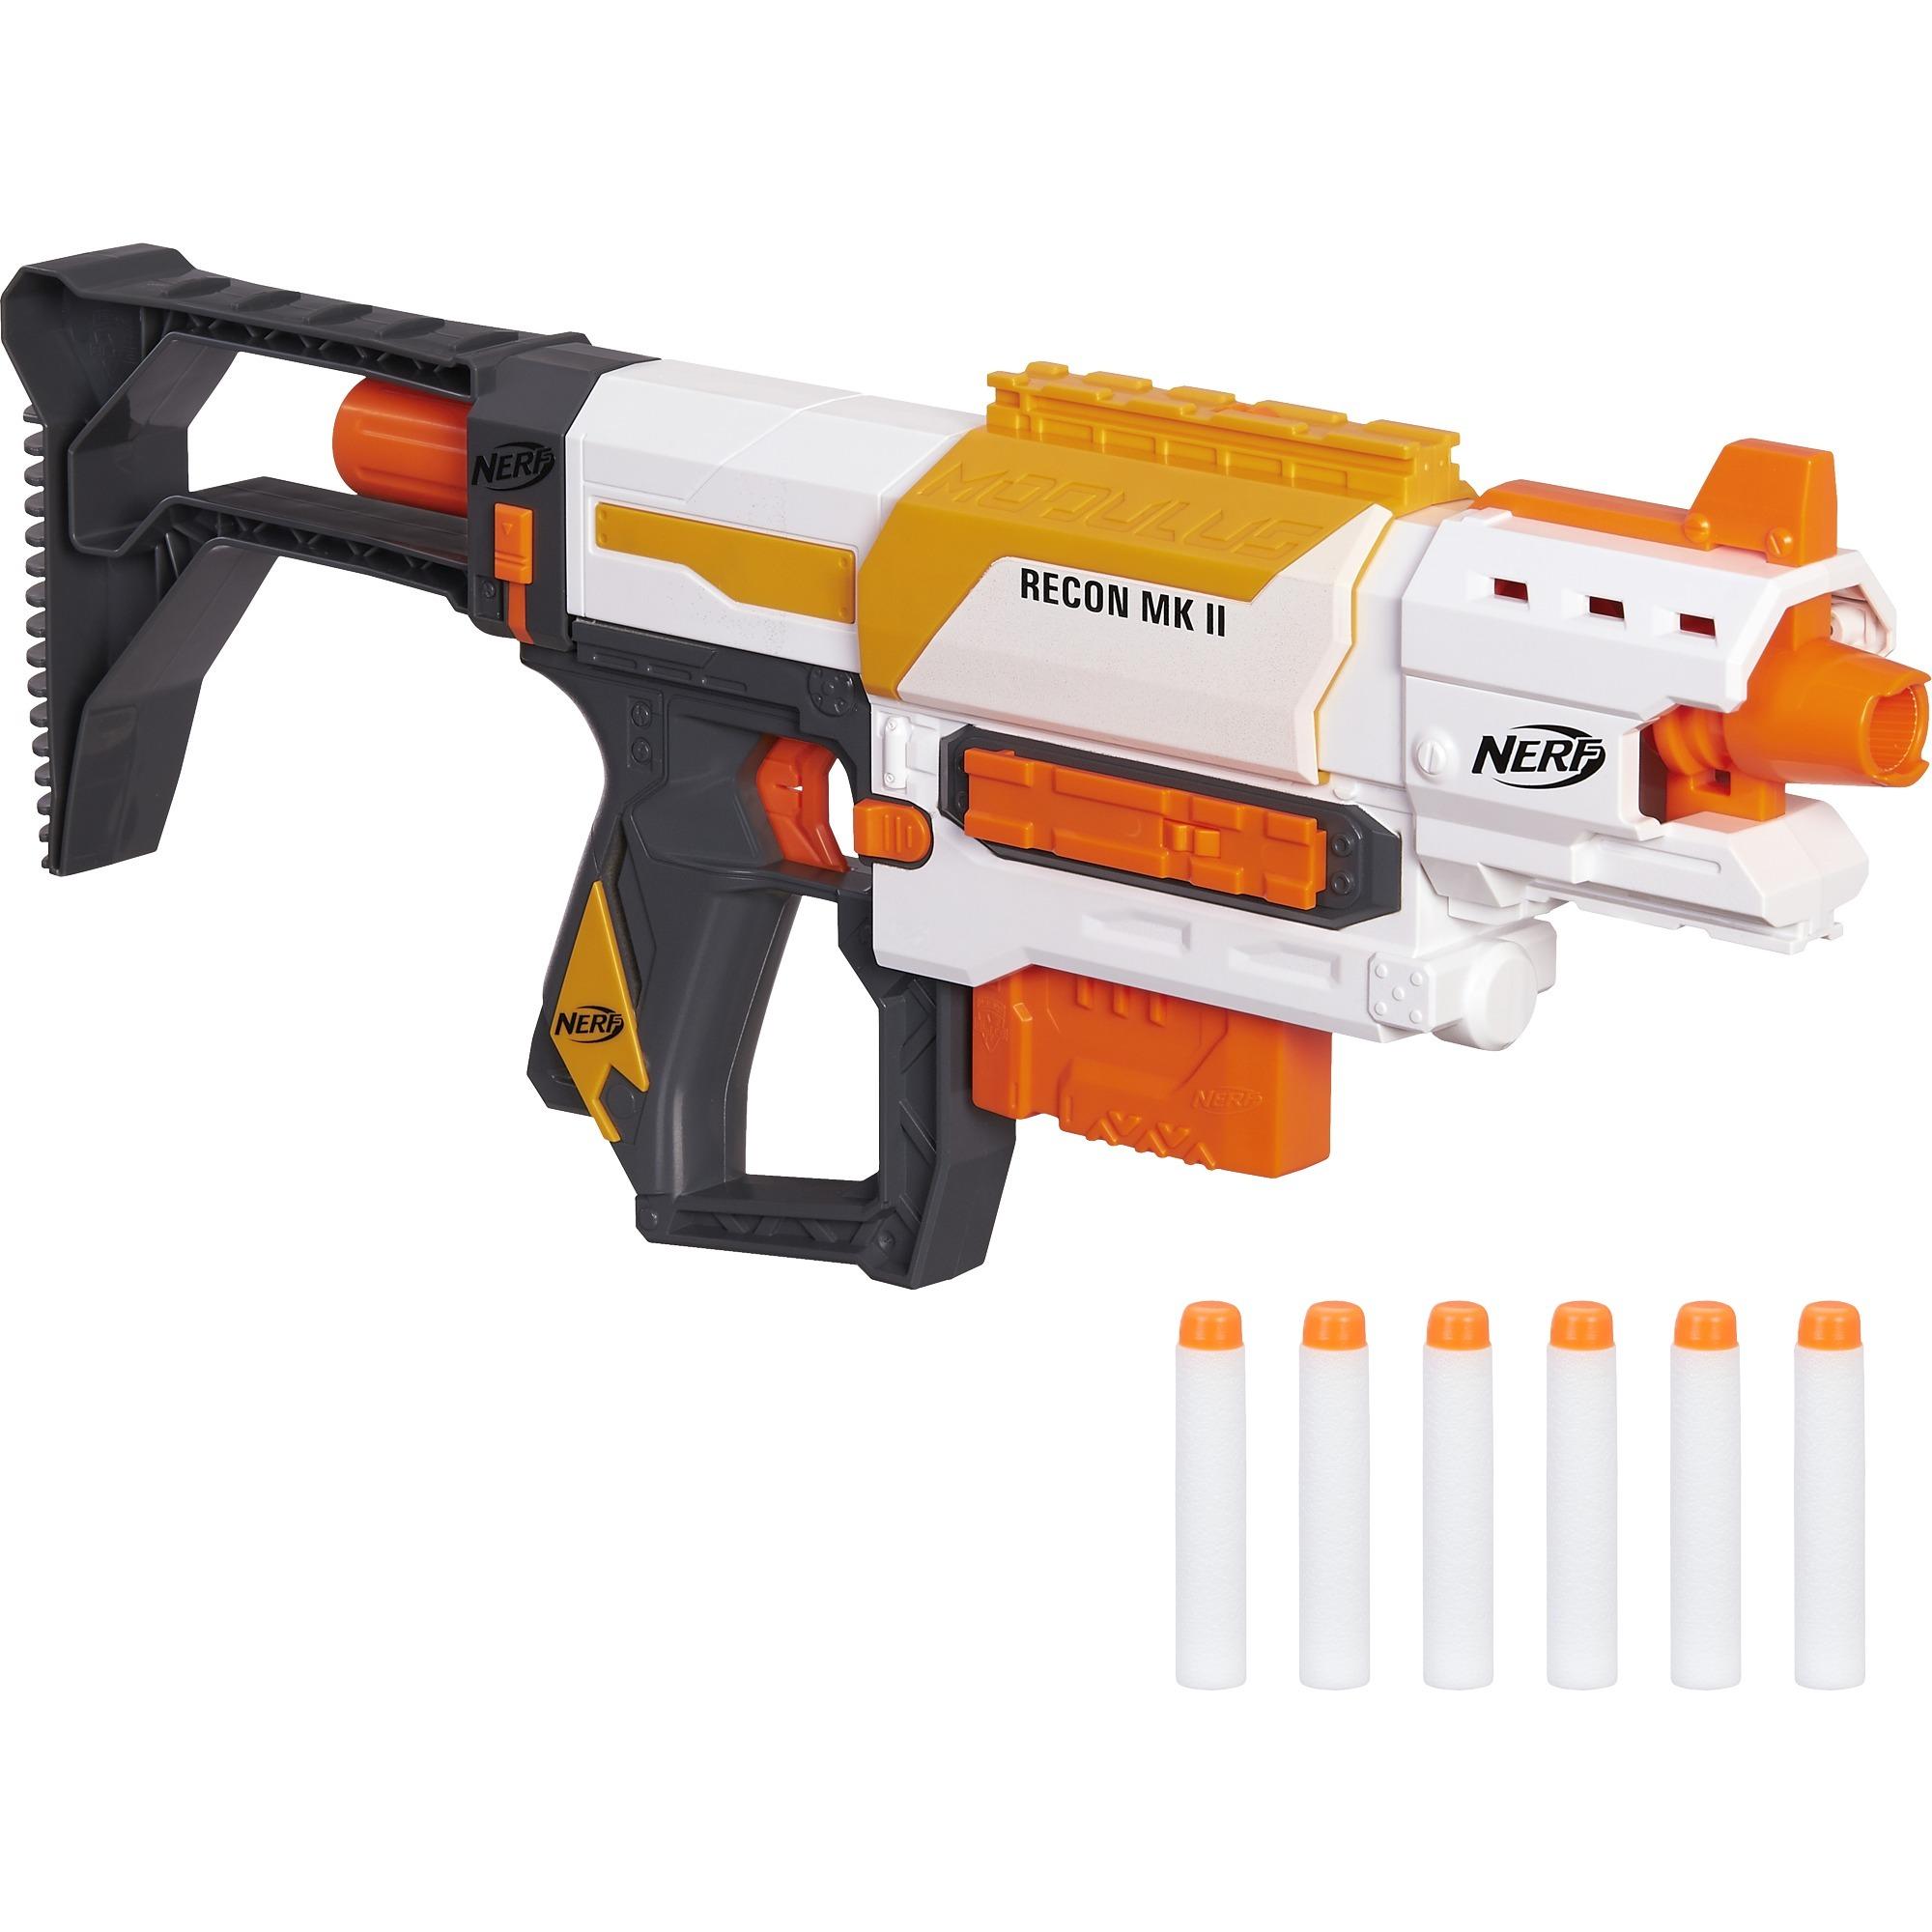 B4616 arma de juguete, Pistola Nerf